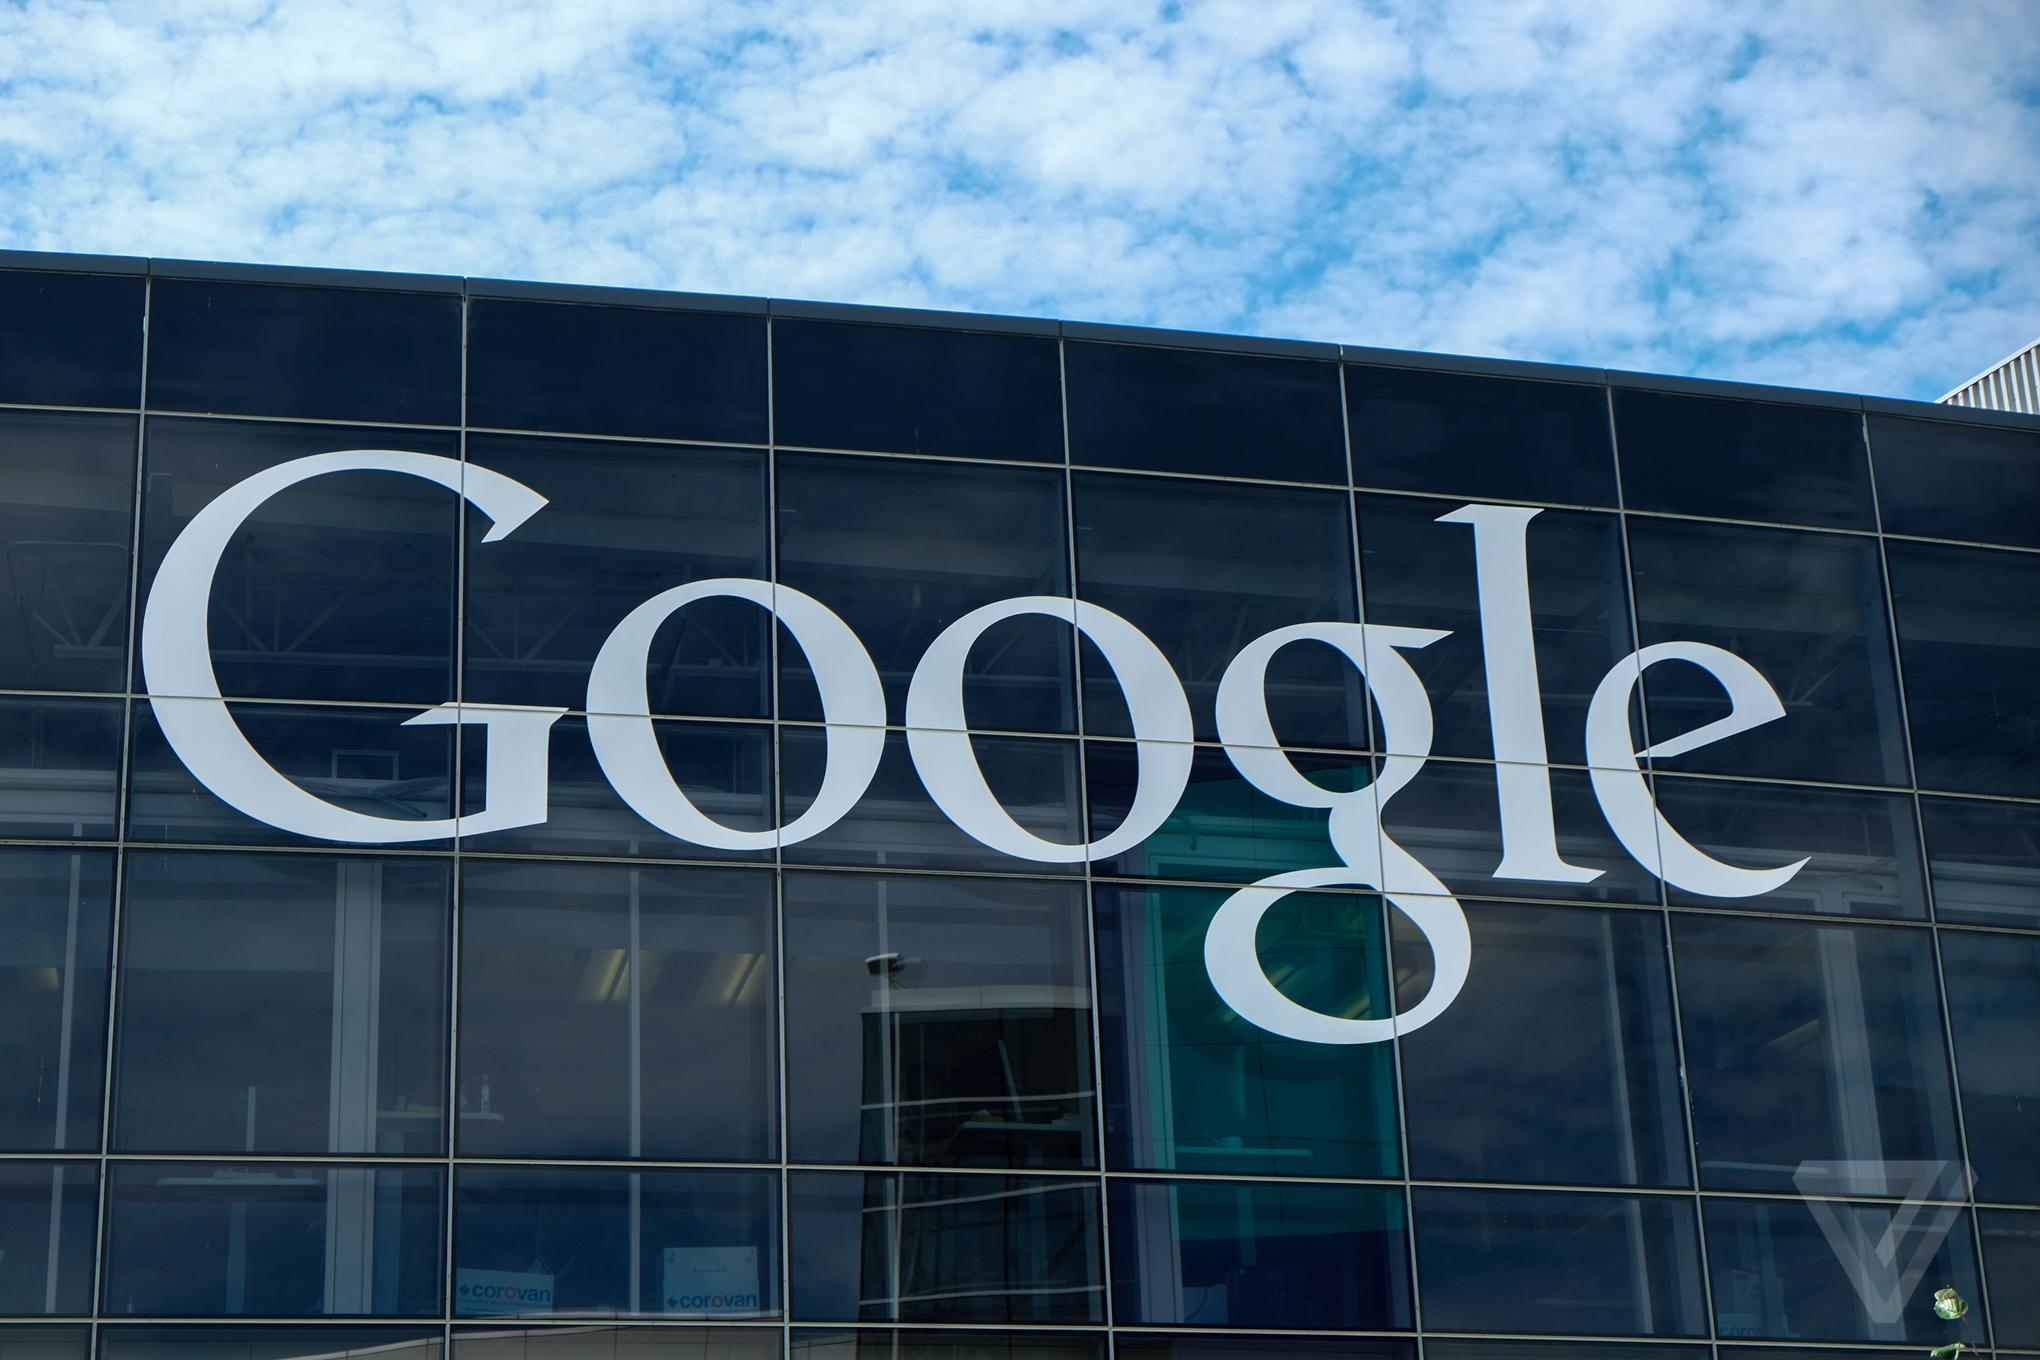 Google sign (stock, 2040)